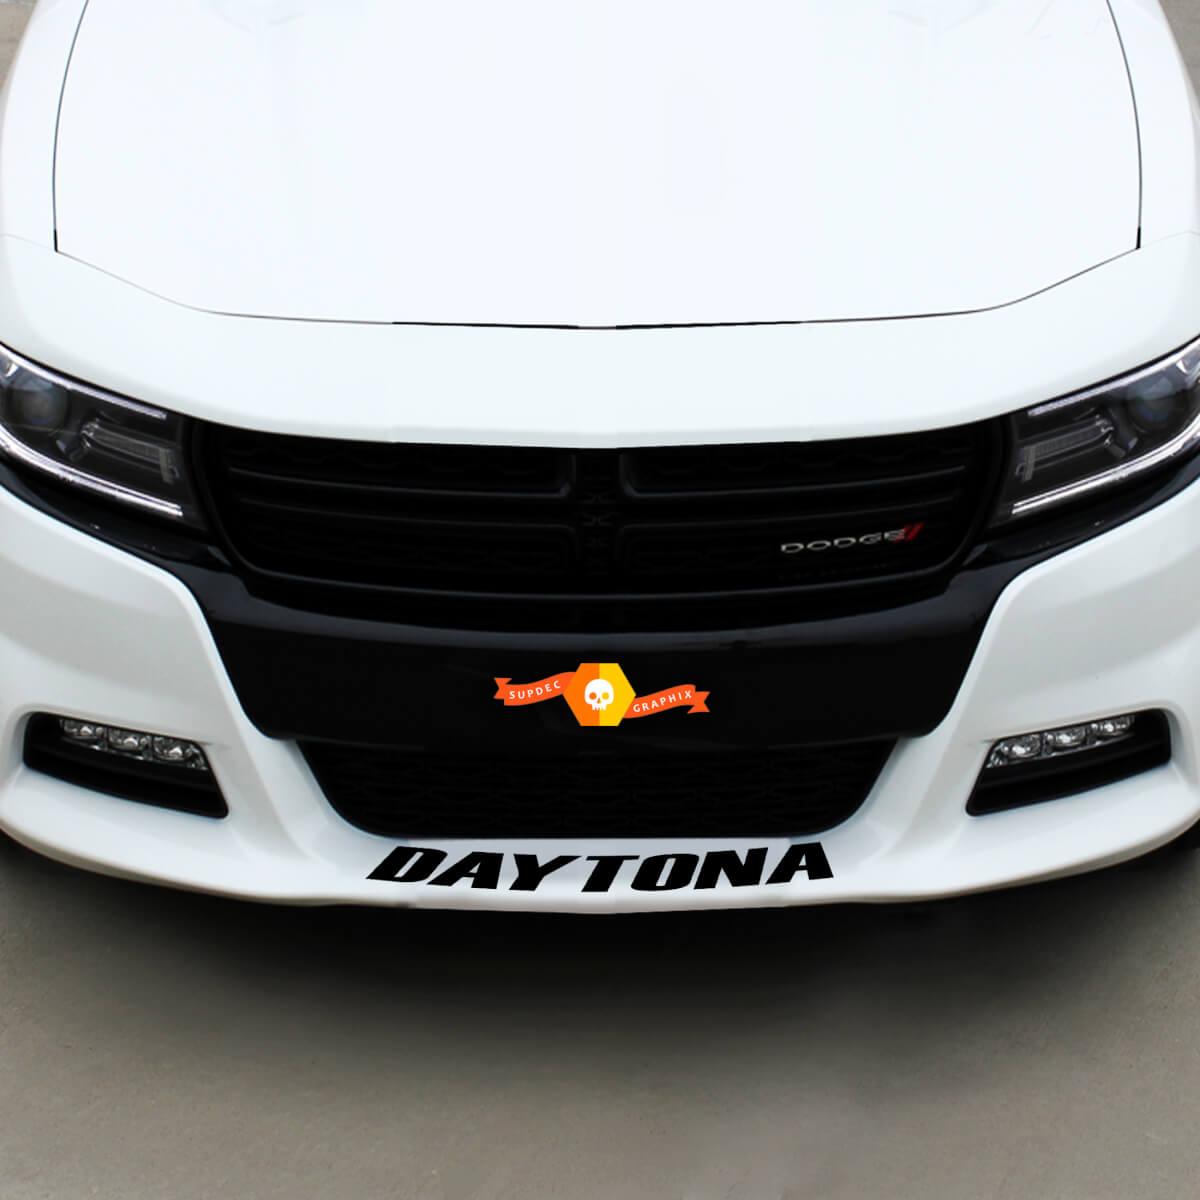 Dodge Daytona Retro Front Spoiler Aufkleber Aufkleber Grafiken passt zu allen Modellen